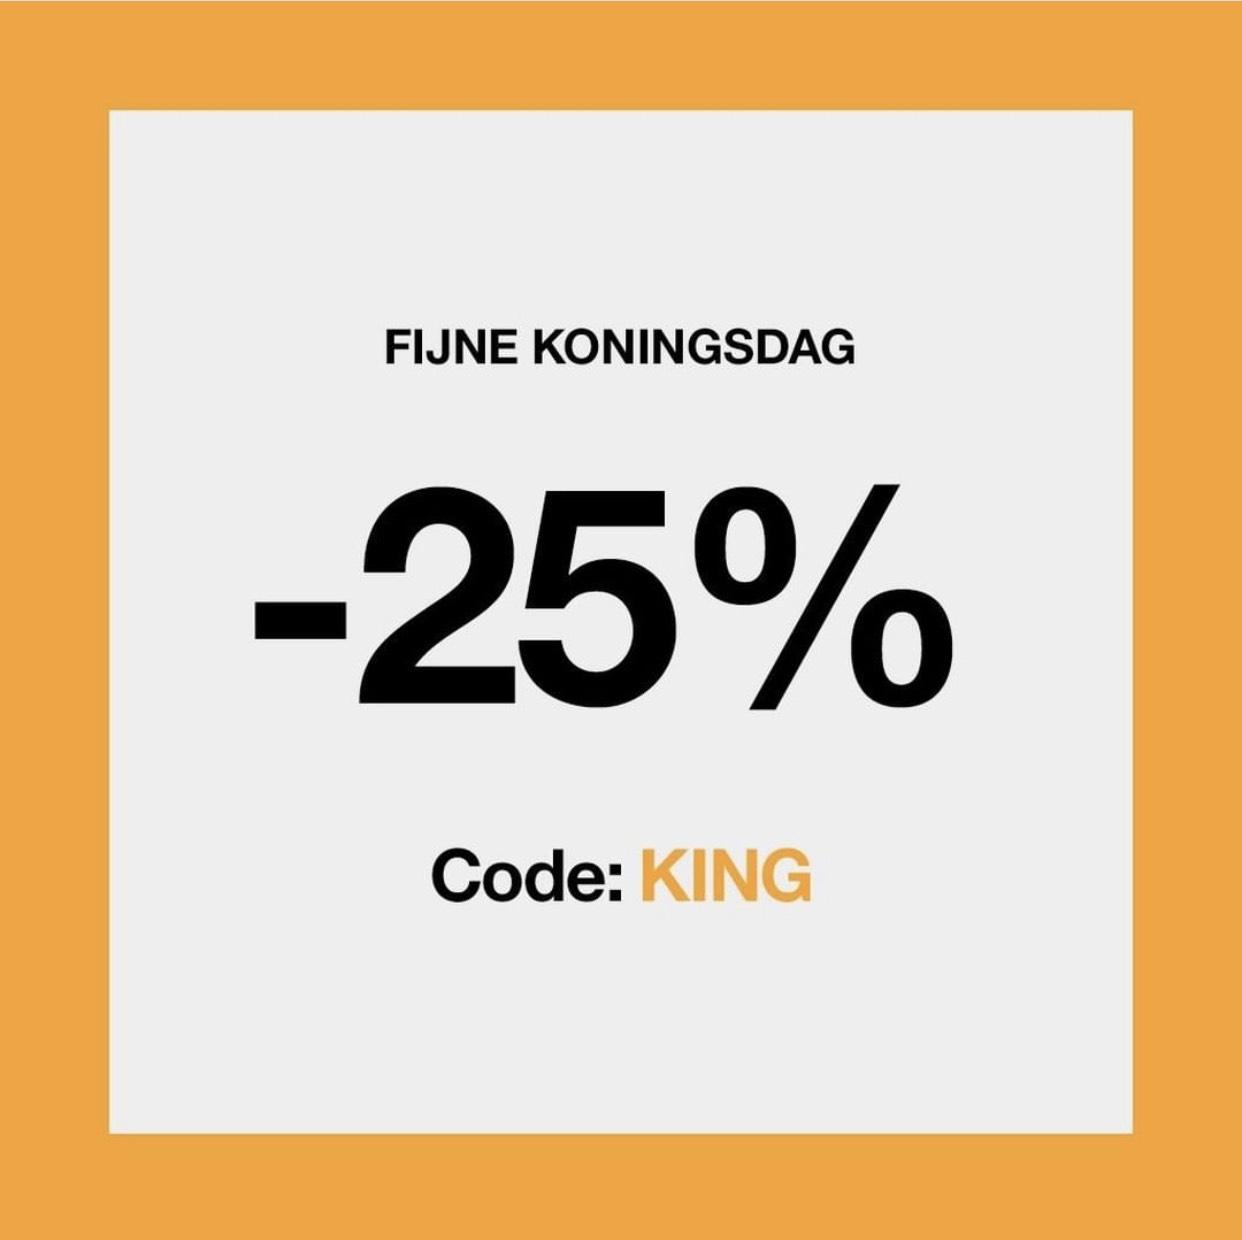 25% korting bij Clinique verzorging artikelen